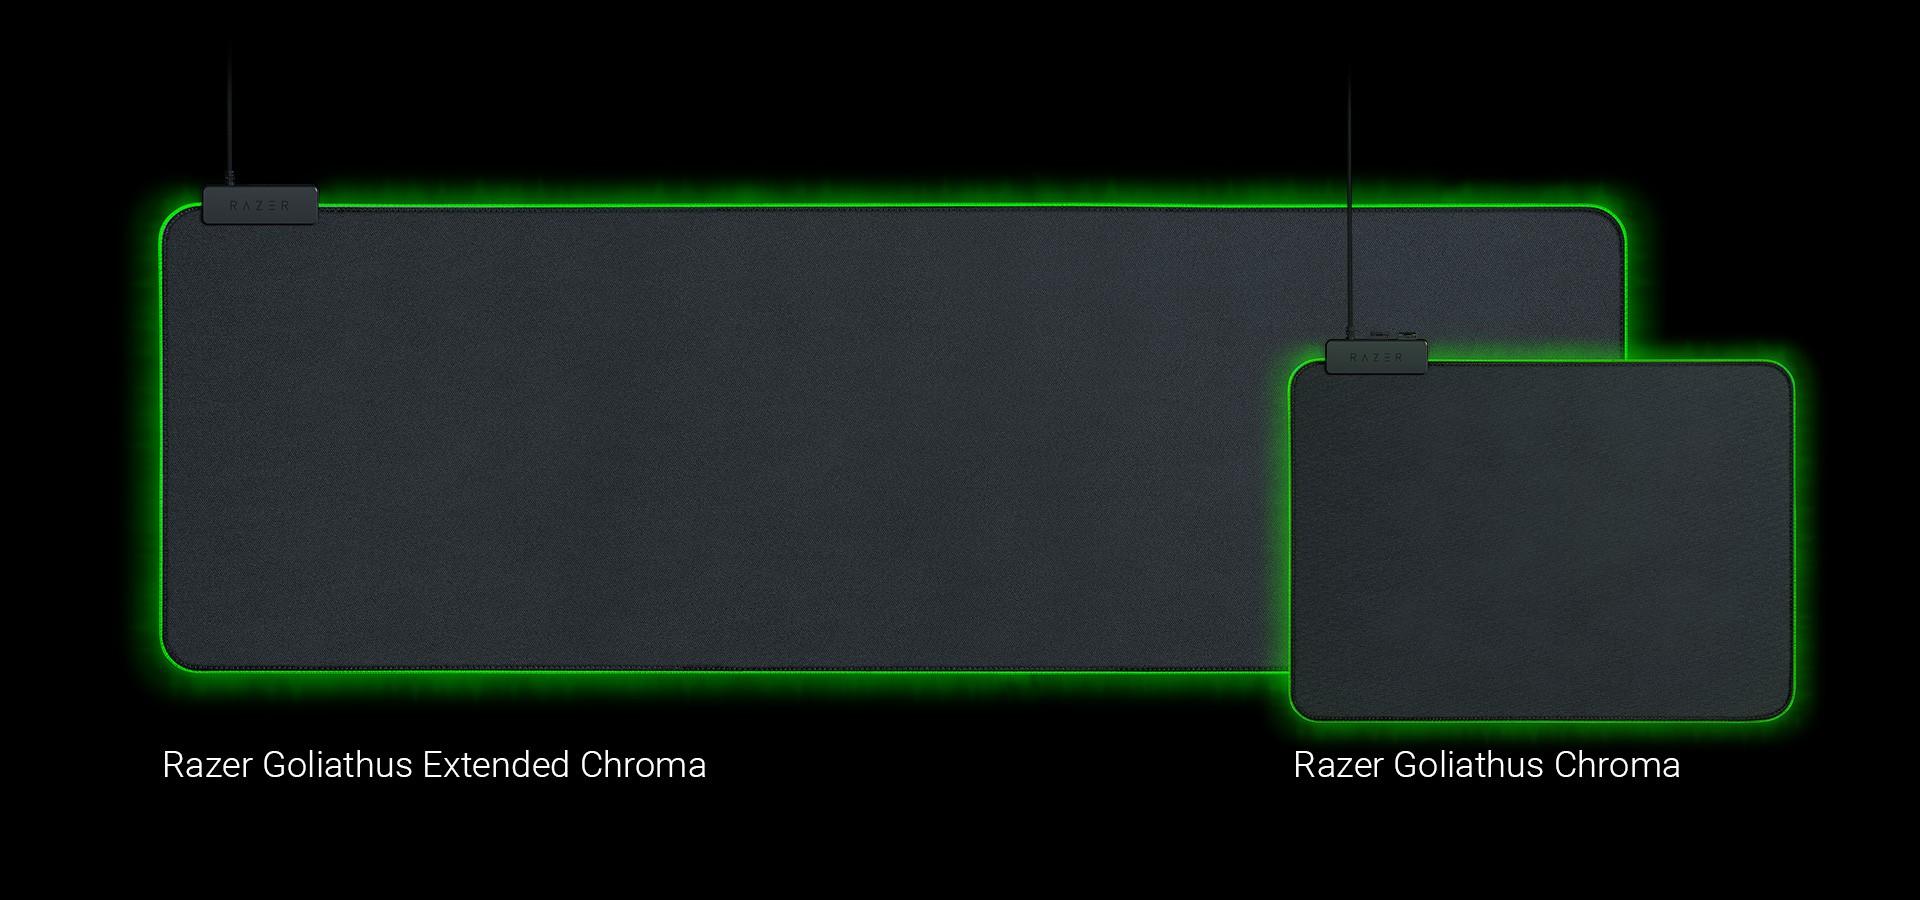 Razer Goliathus Extended Chroma 920x294x3mm surface